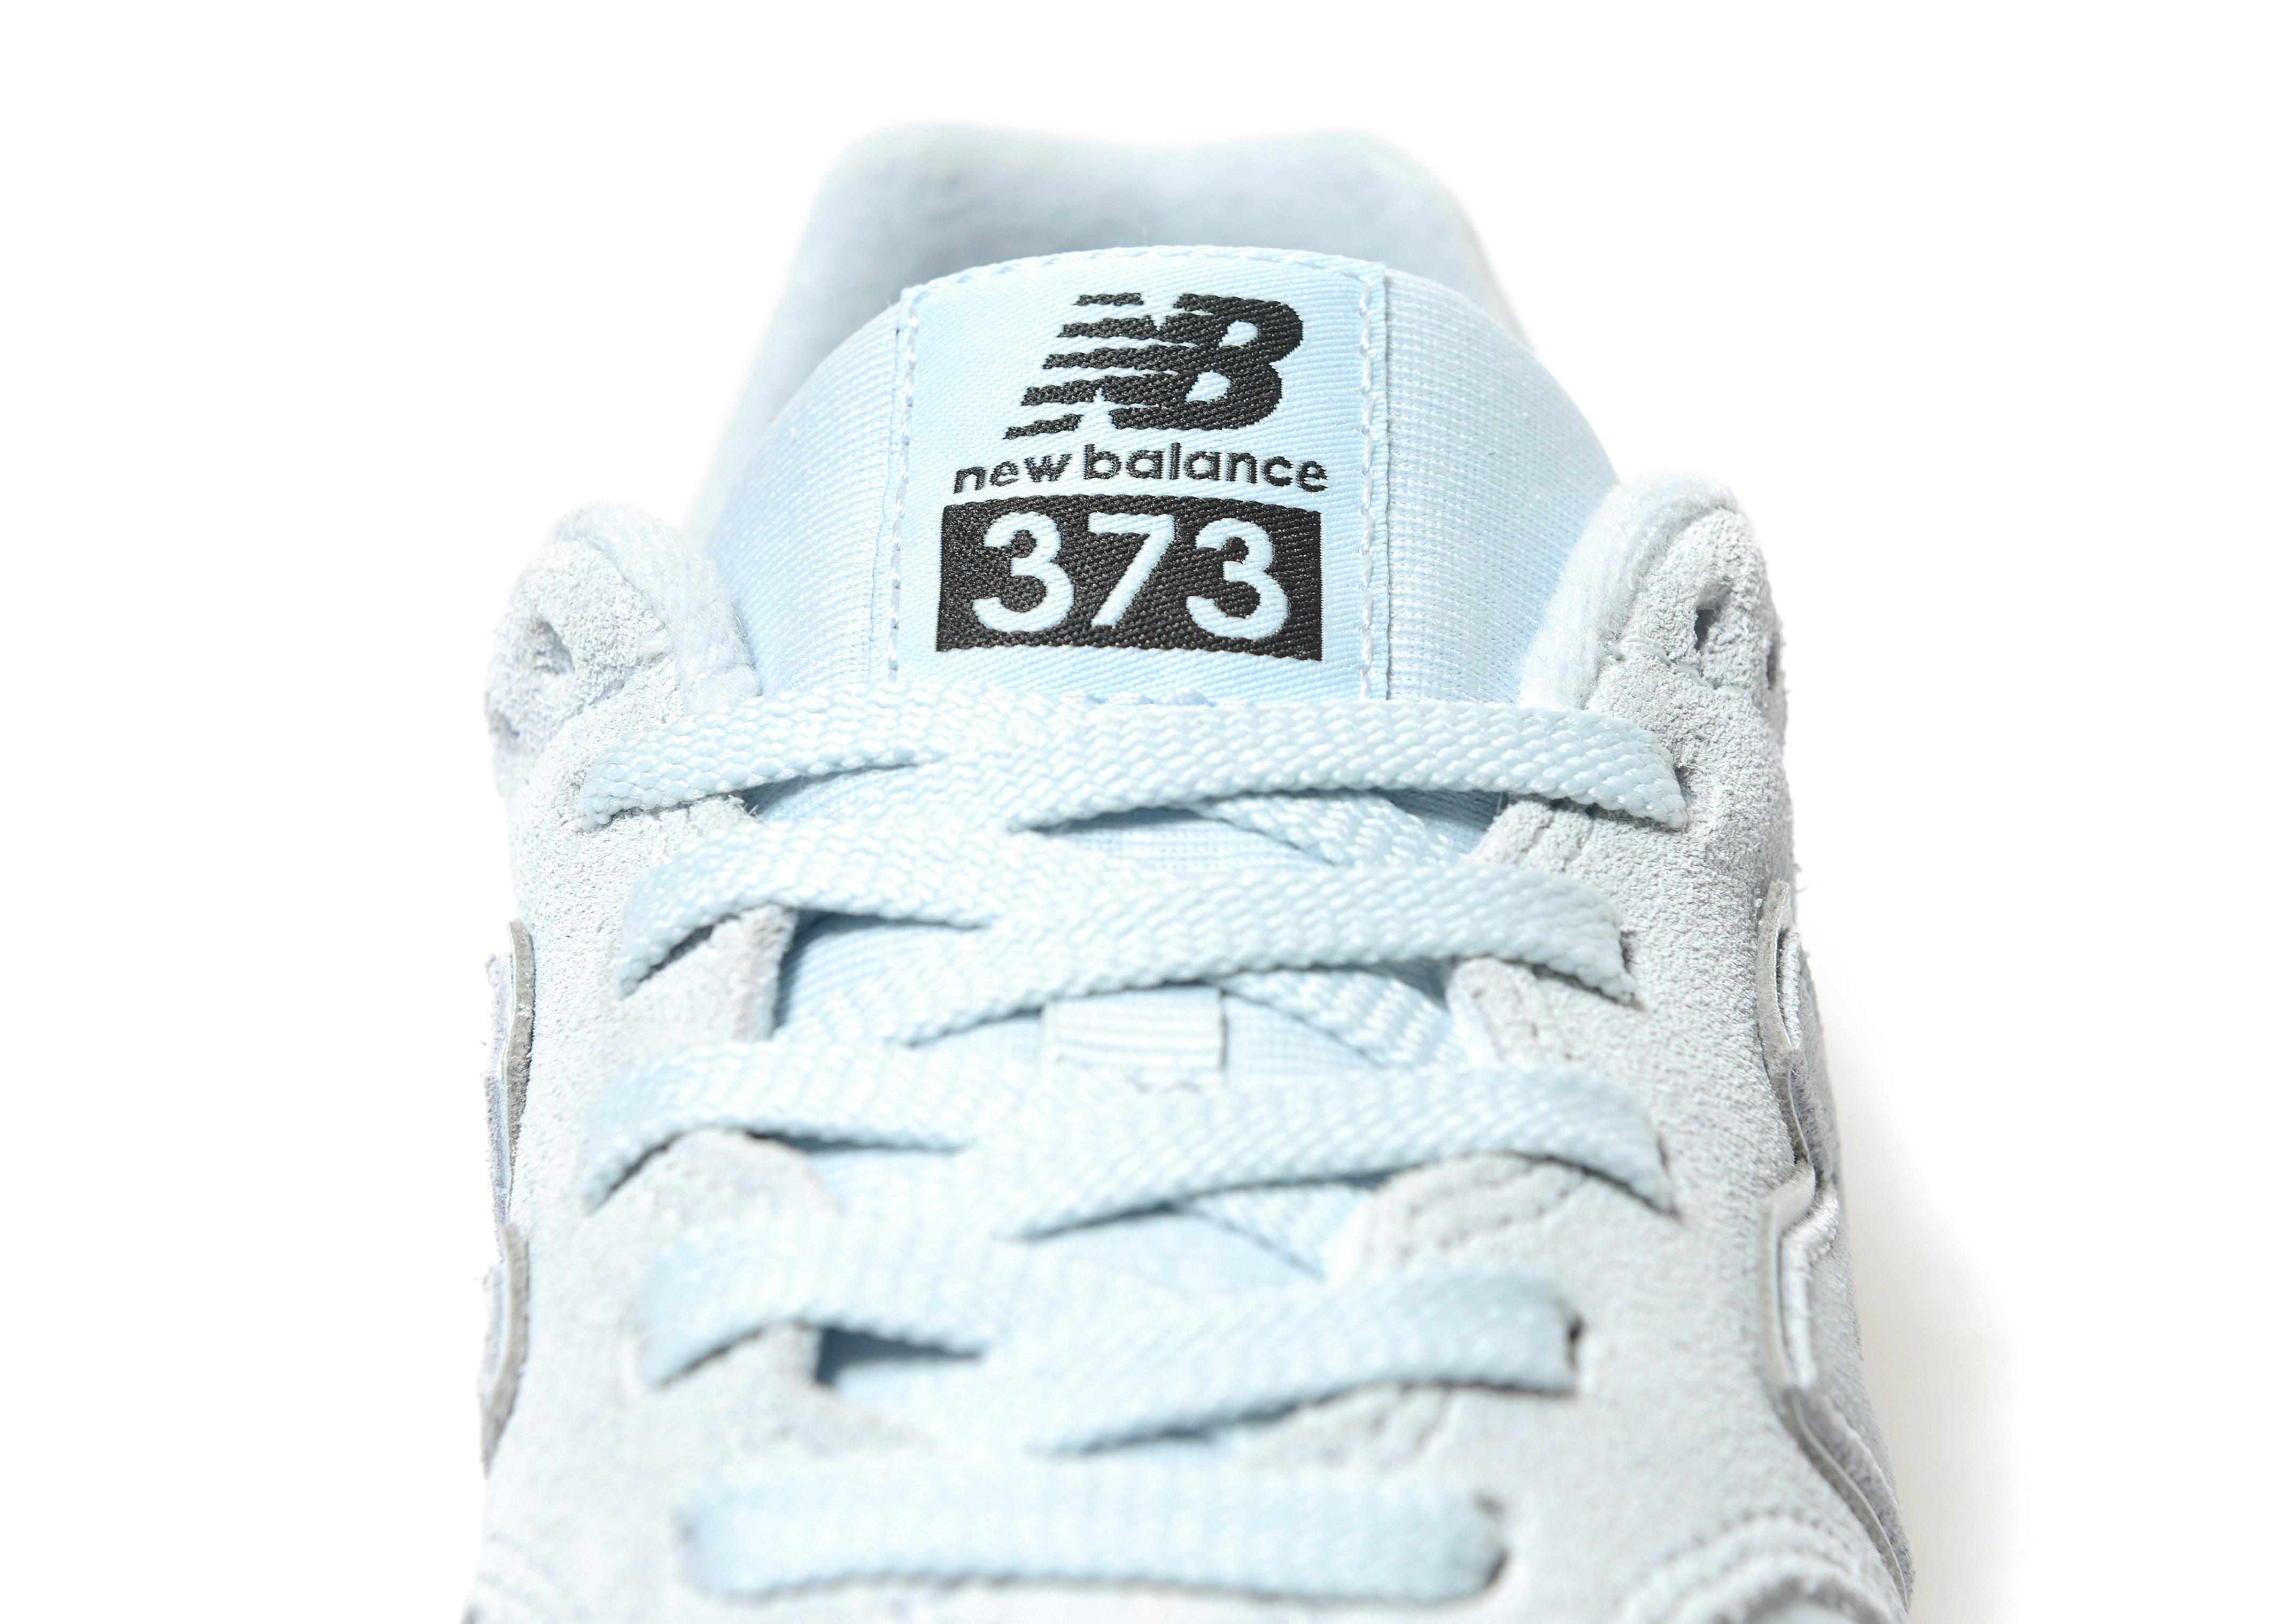 new balance 373 baby blue